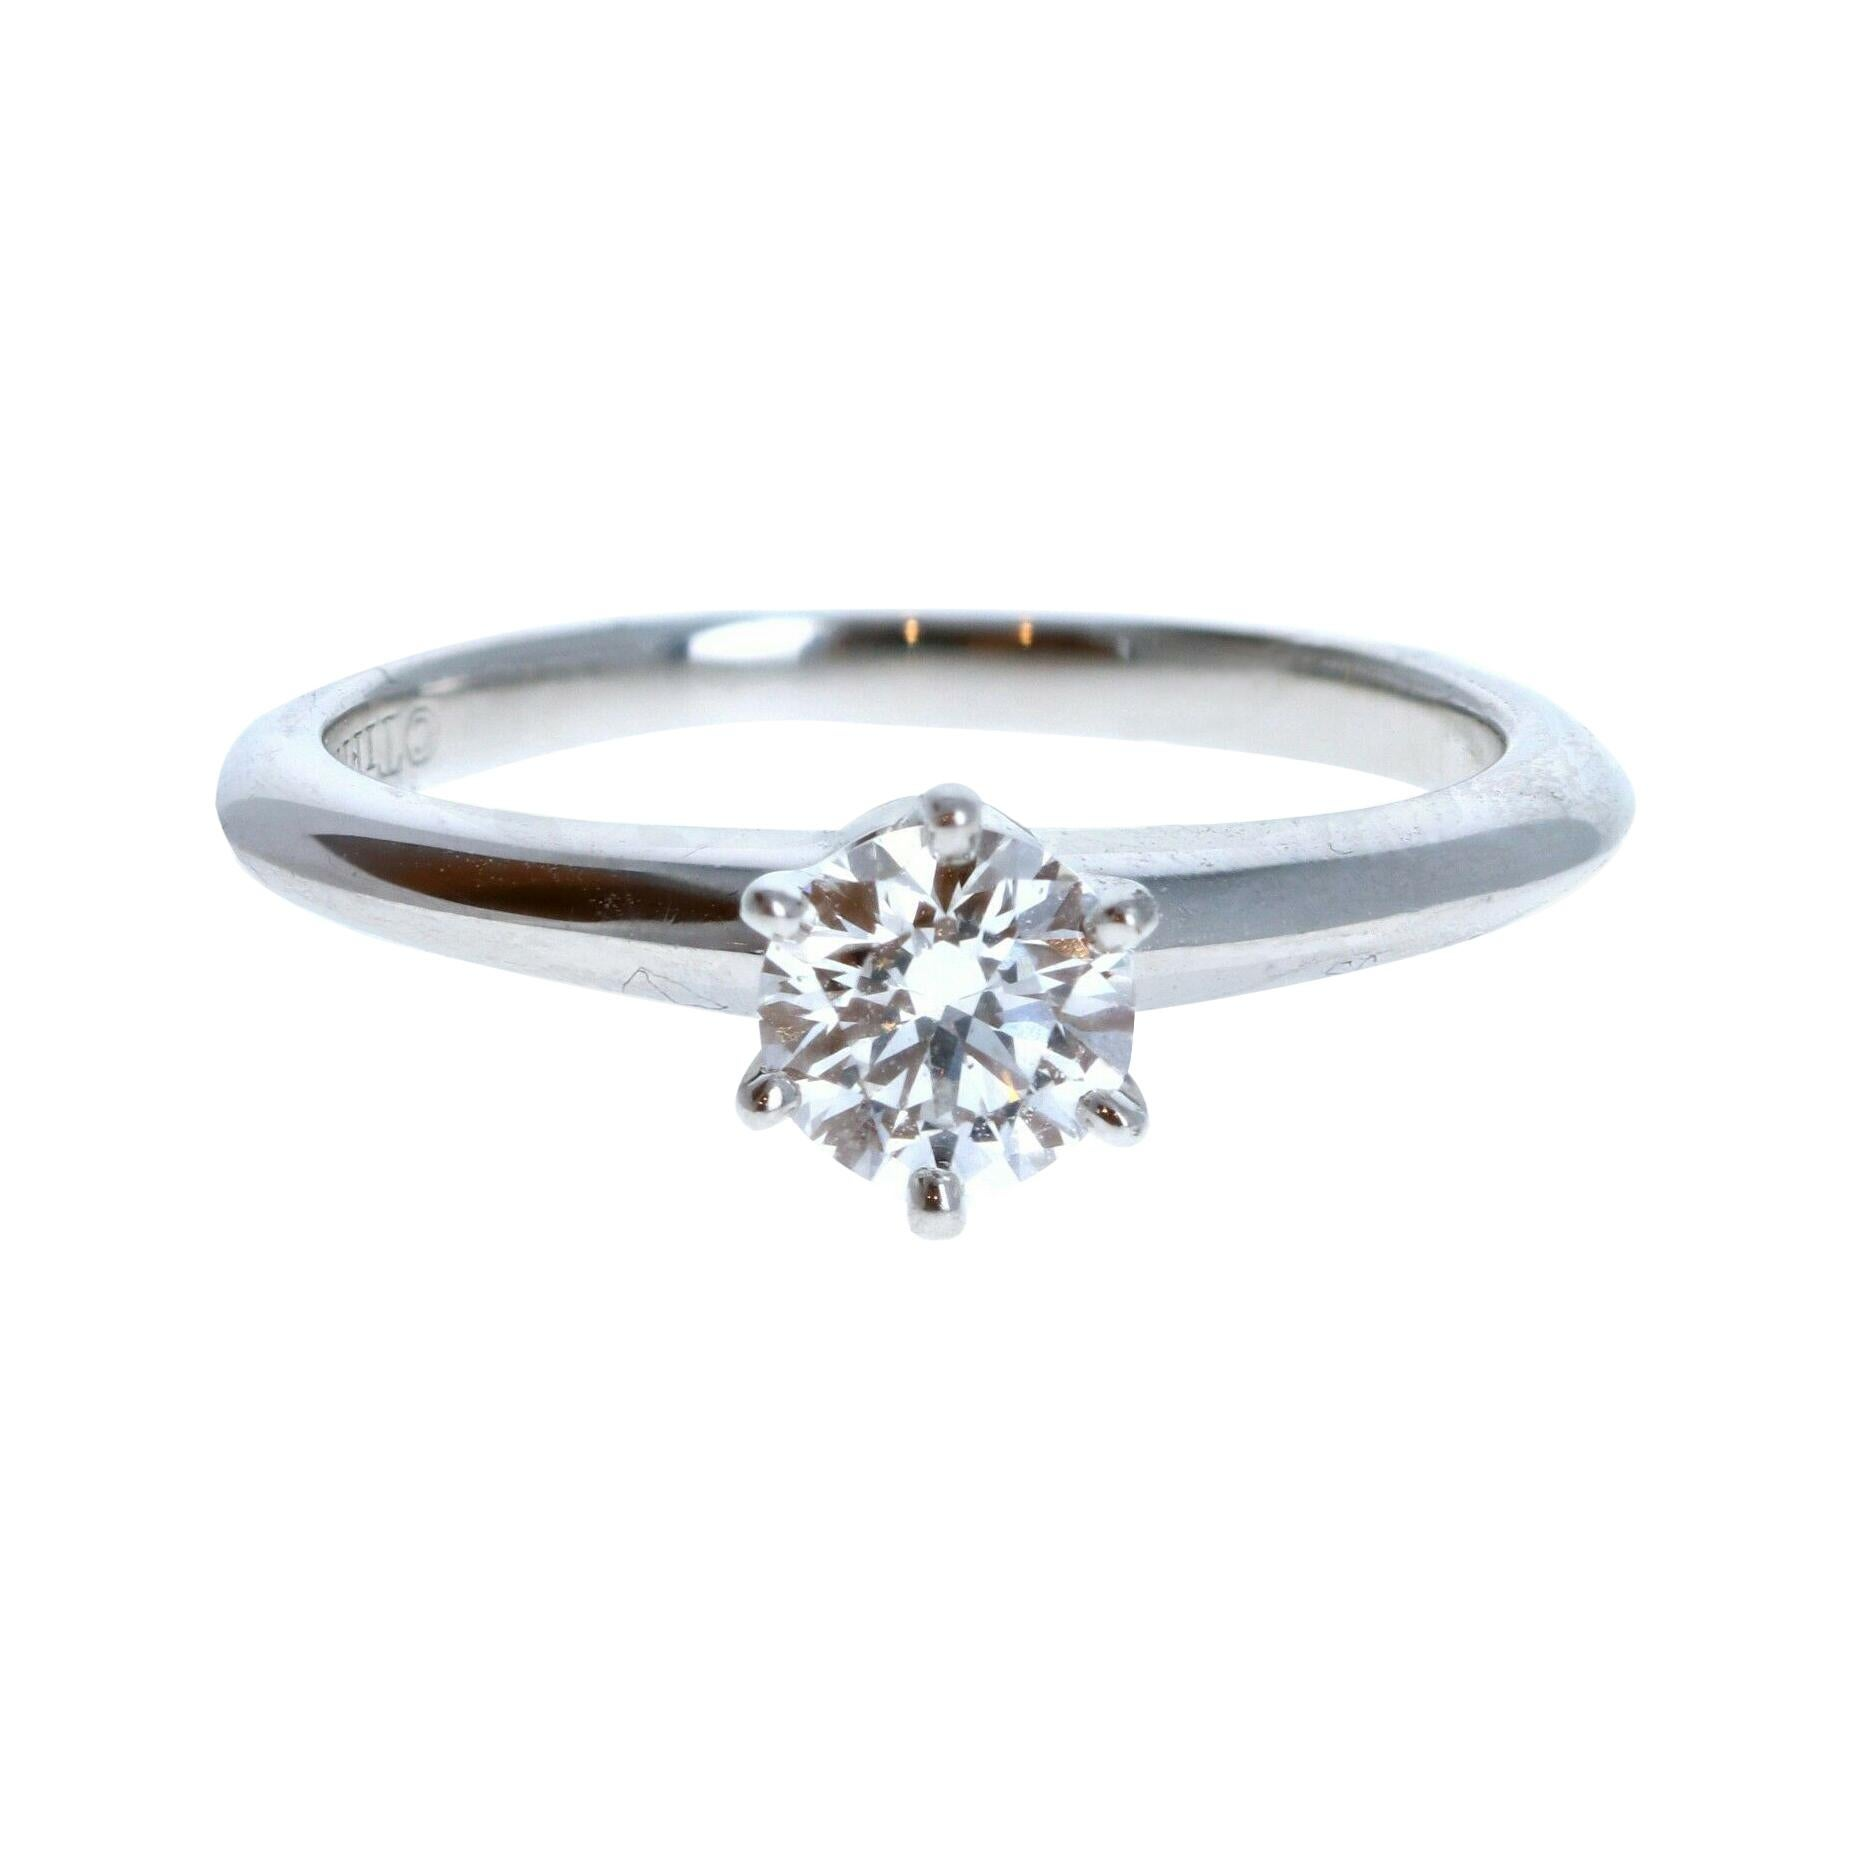 Tiffany & Co. Platinum & Diamond Solitaire Ring 0.44ctw